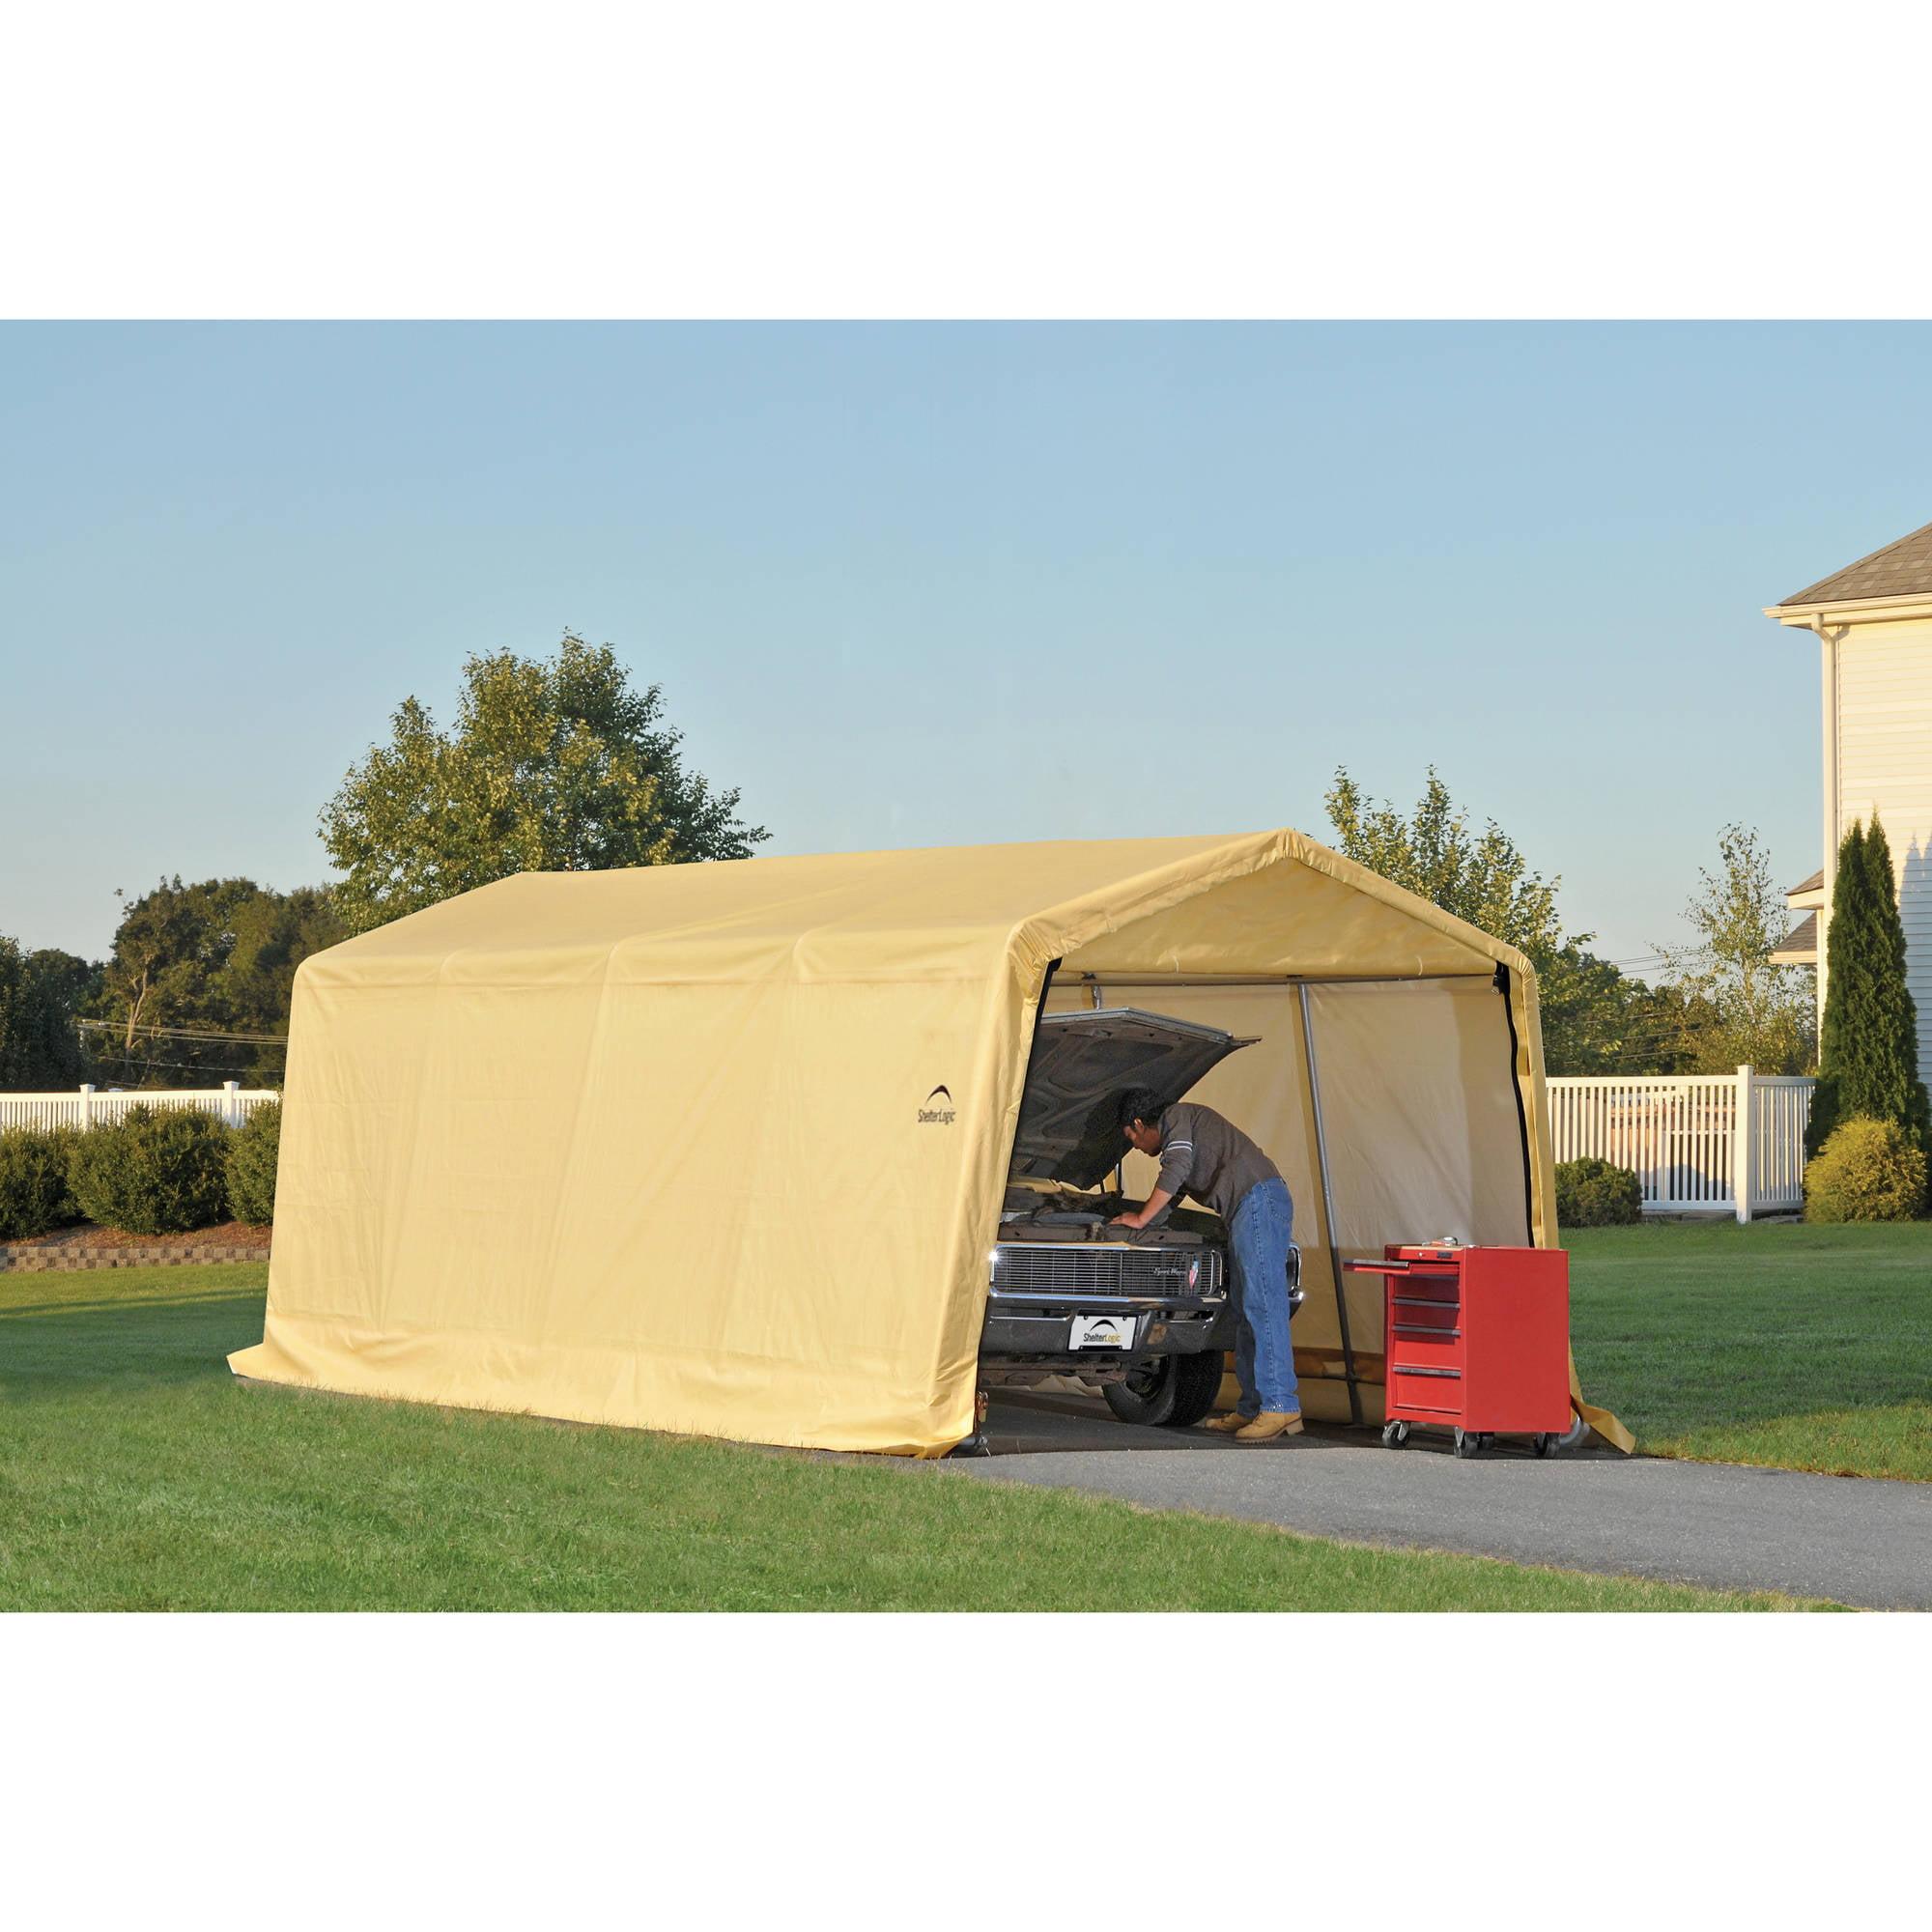 Auto Shelter 10' x 20 x8' Peak Style Instant Garage, Sandstone by ShelterLogic